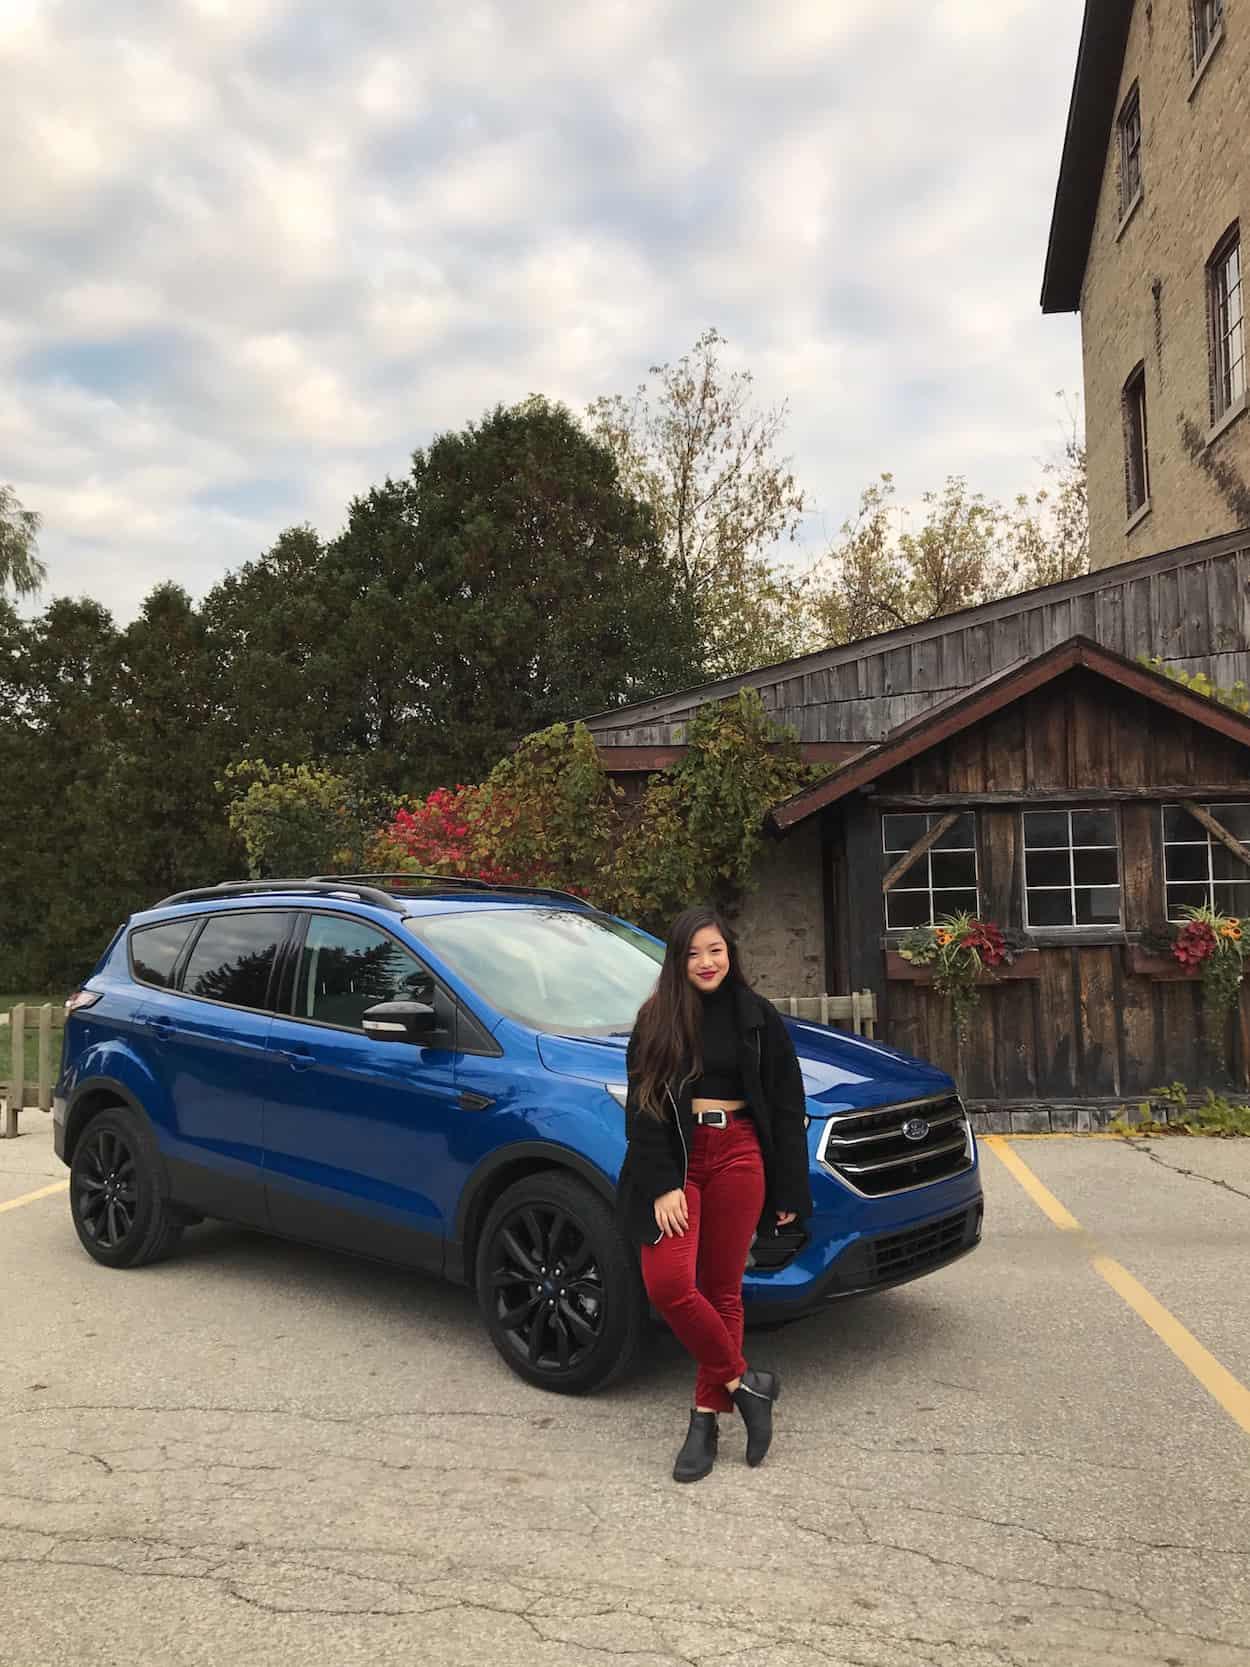 Ford Explorer in Guelph, Ontario